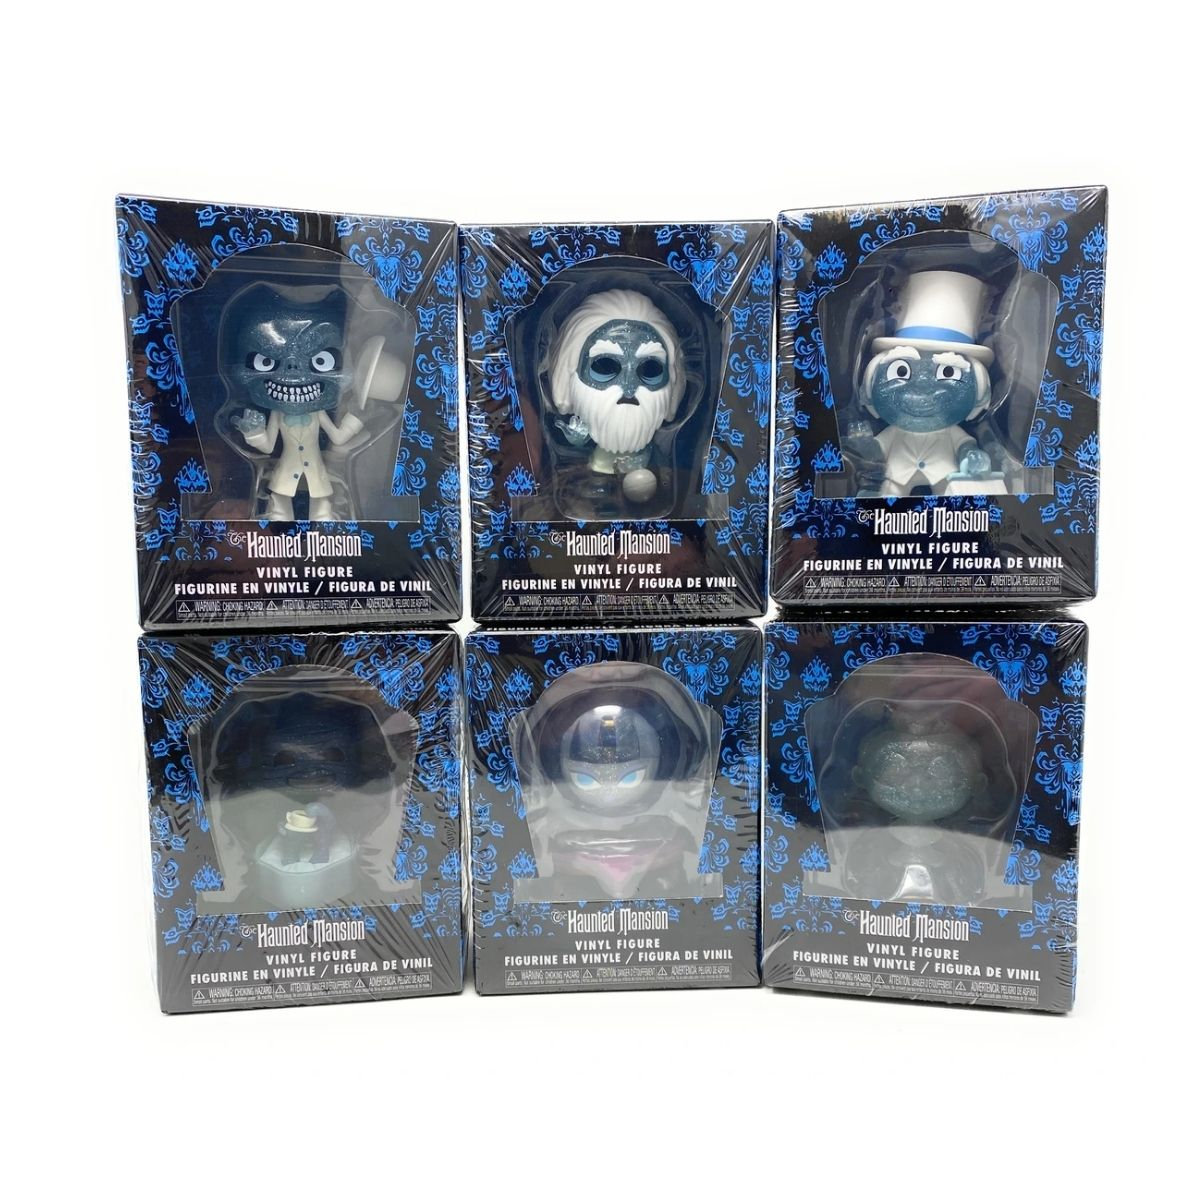 Haunted Mansion Funko Mini Mystery com 6 personagens   - Game Land Brinquedos